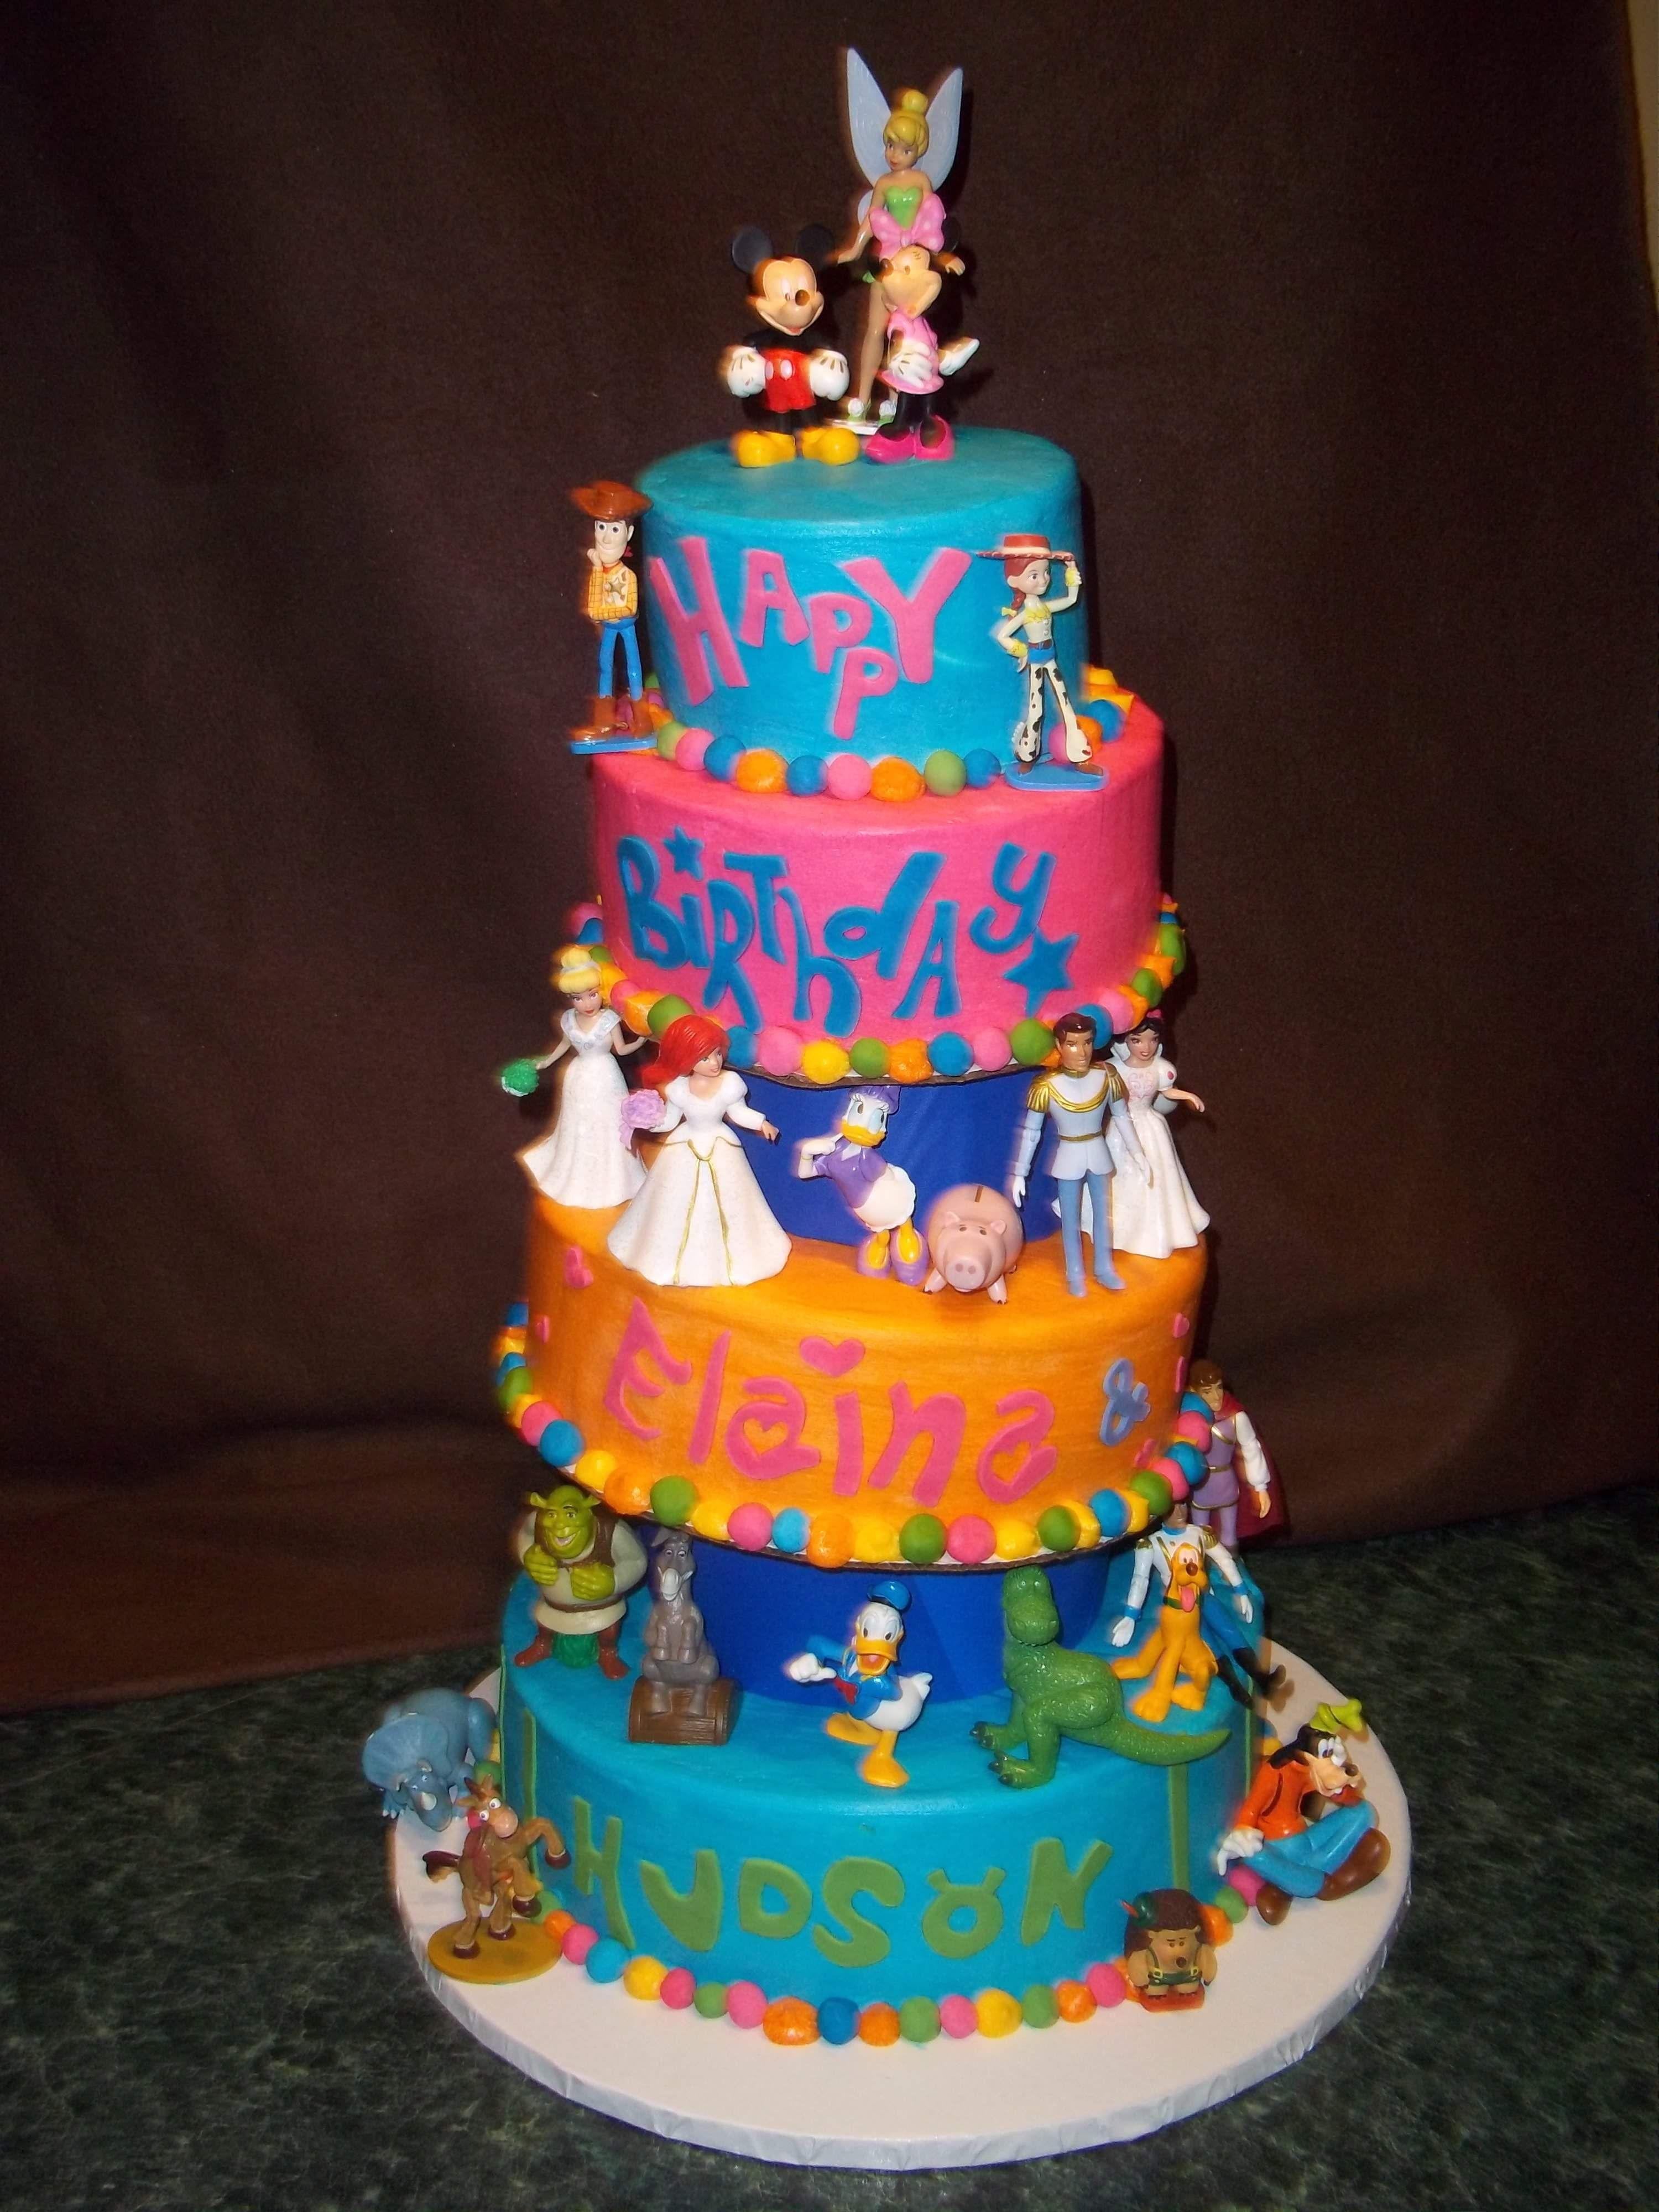 Strange Mixed Disney Characters Cake With Images Disney Birthday Cakes Funny Birthday Cards Online Inifodamsfinfo